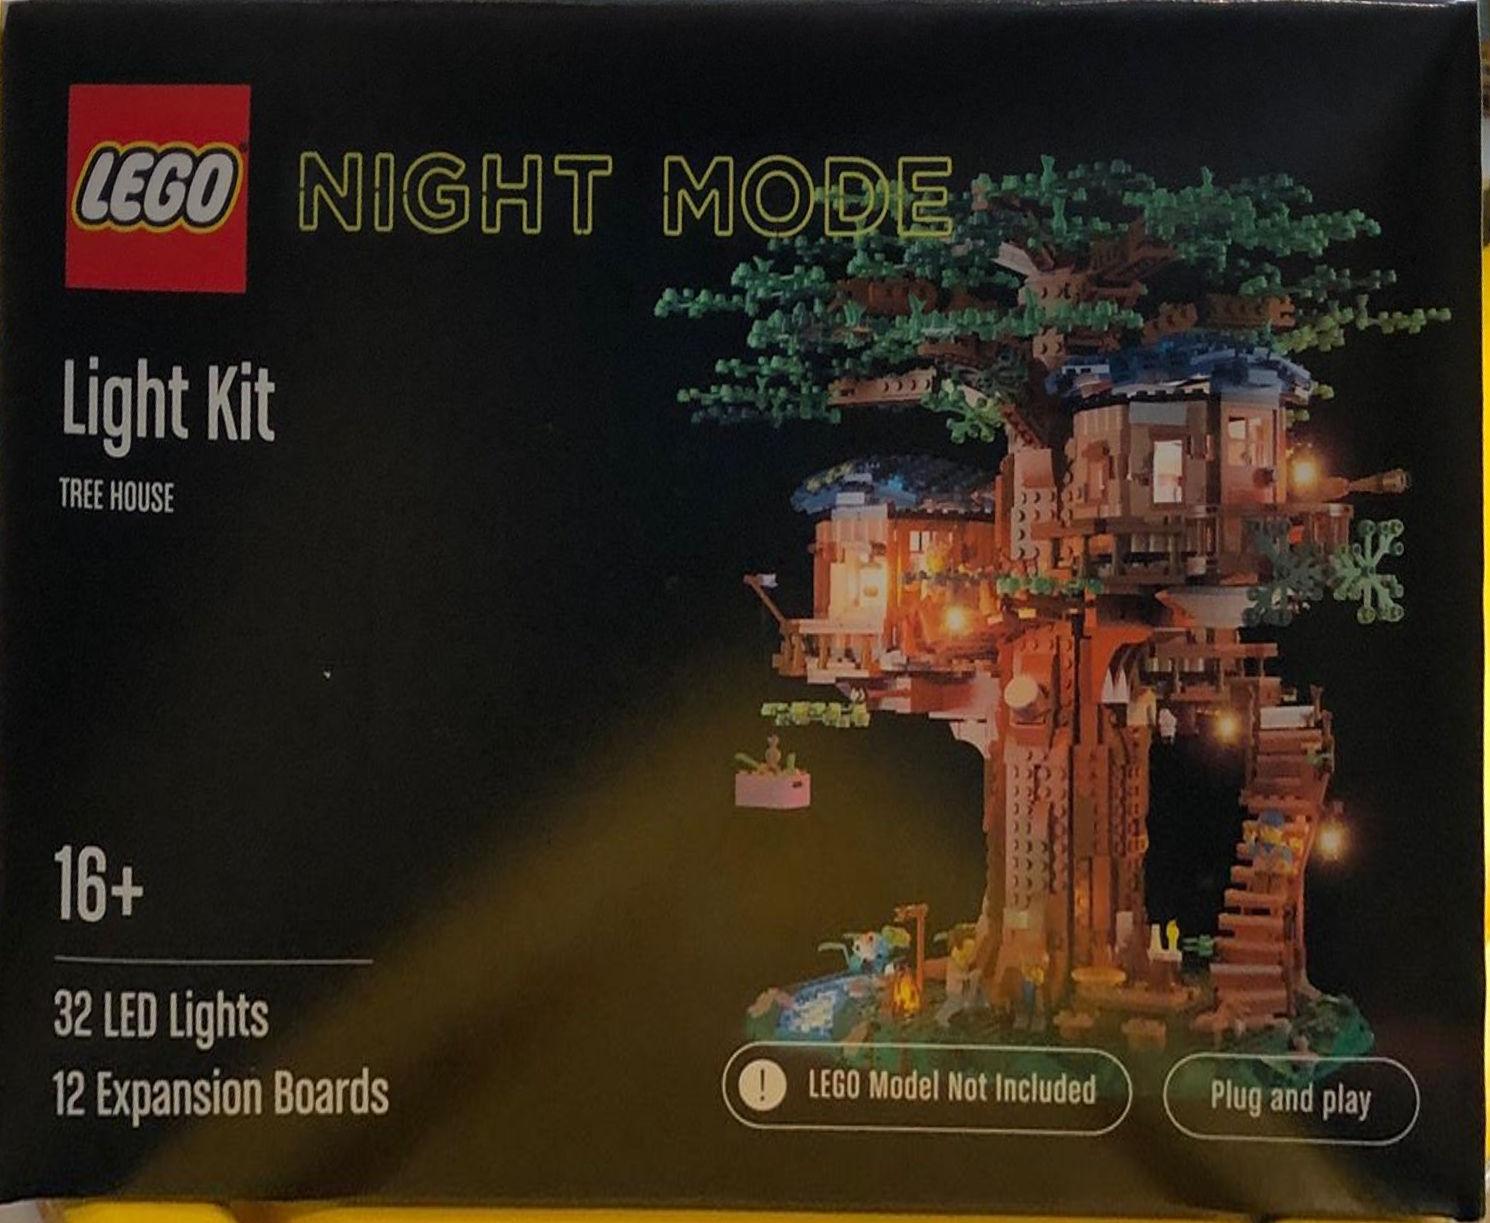 "BRICKSTUFF 6/"" EXTENSION CABLES FOR BRICKSTUFF LEGO LIGHTING SYSTEM 4-PACK"